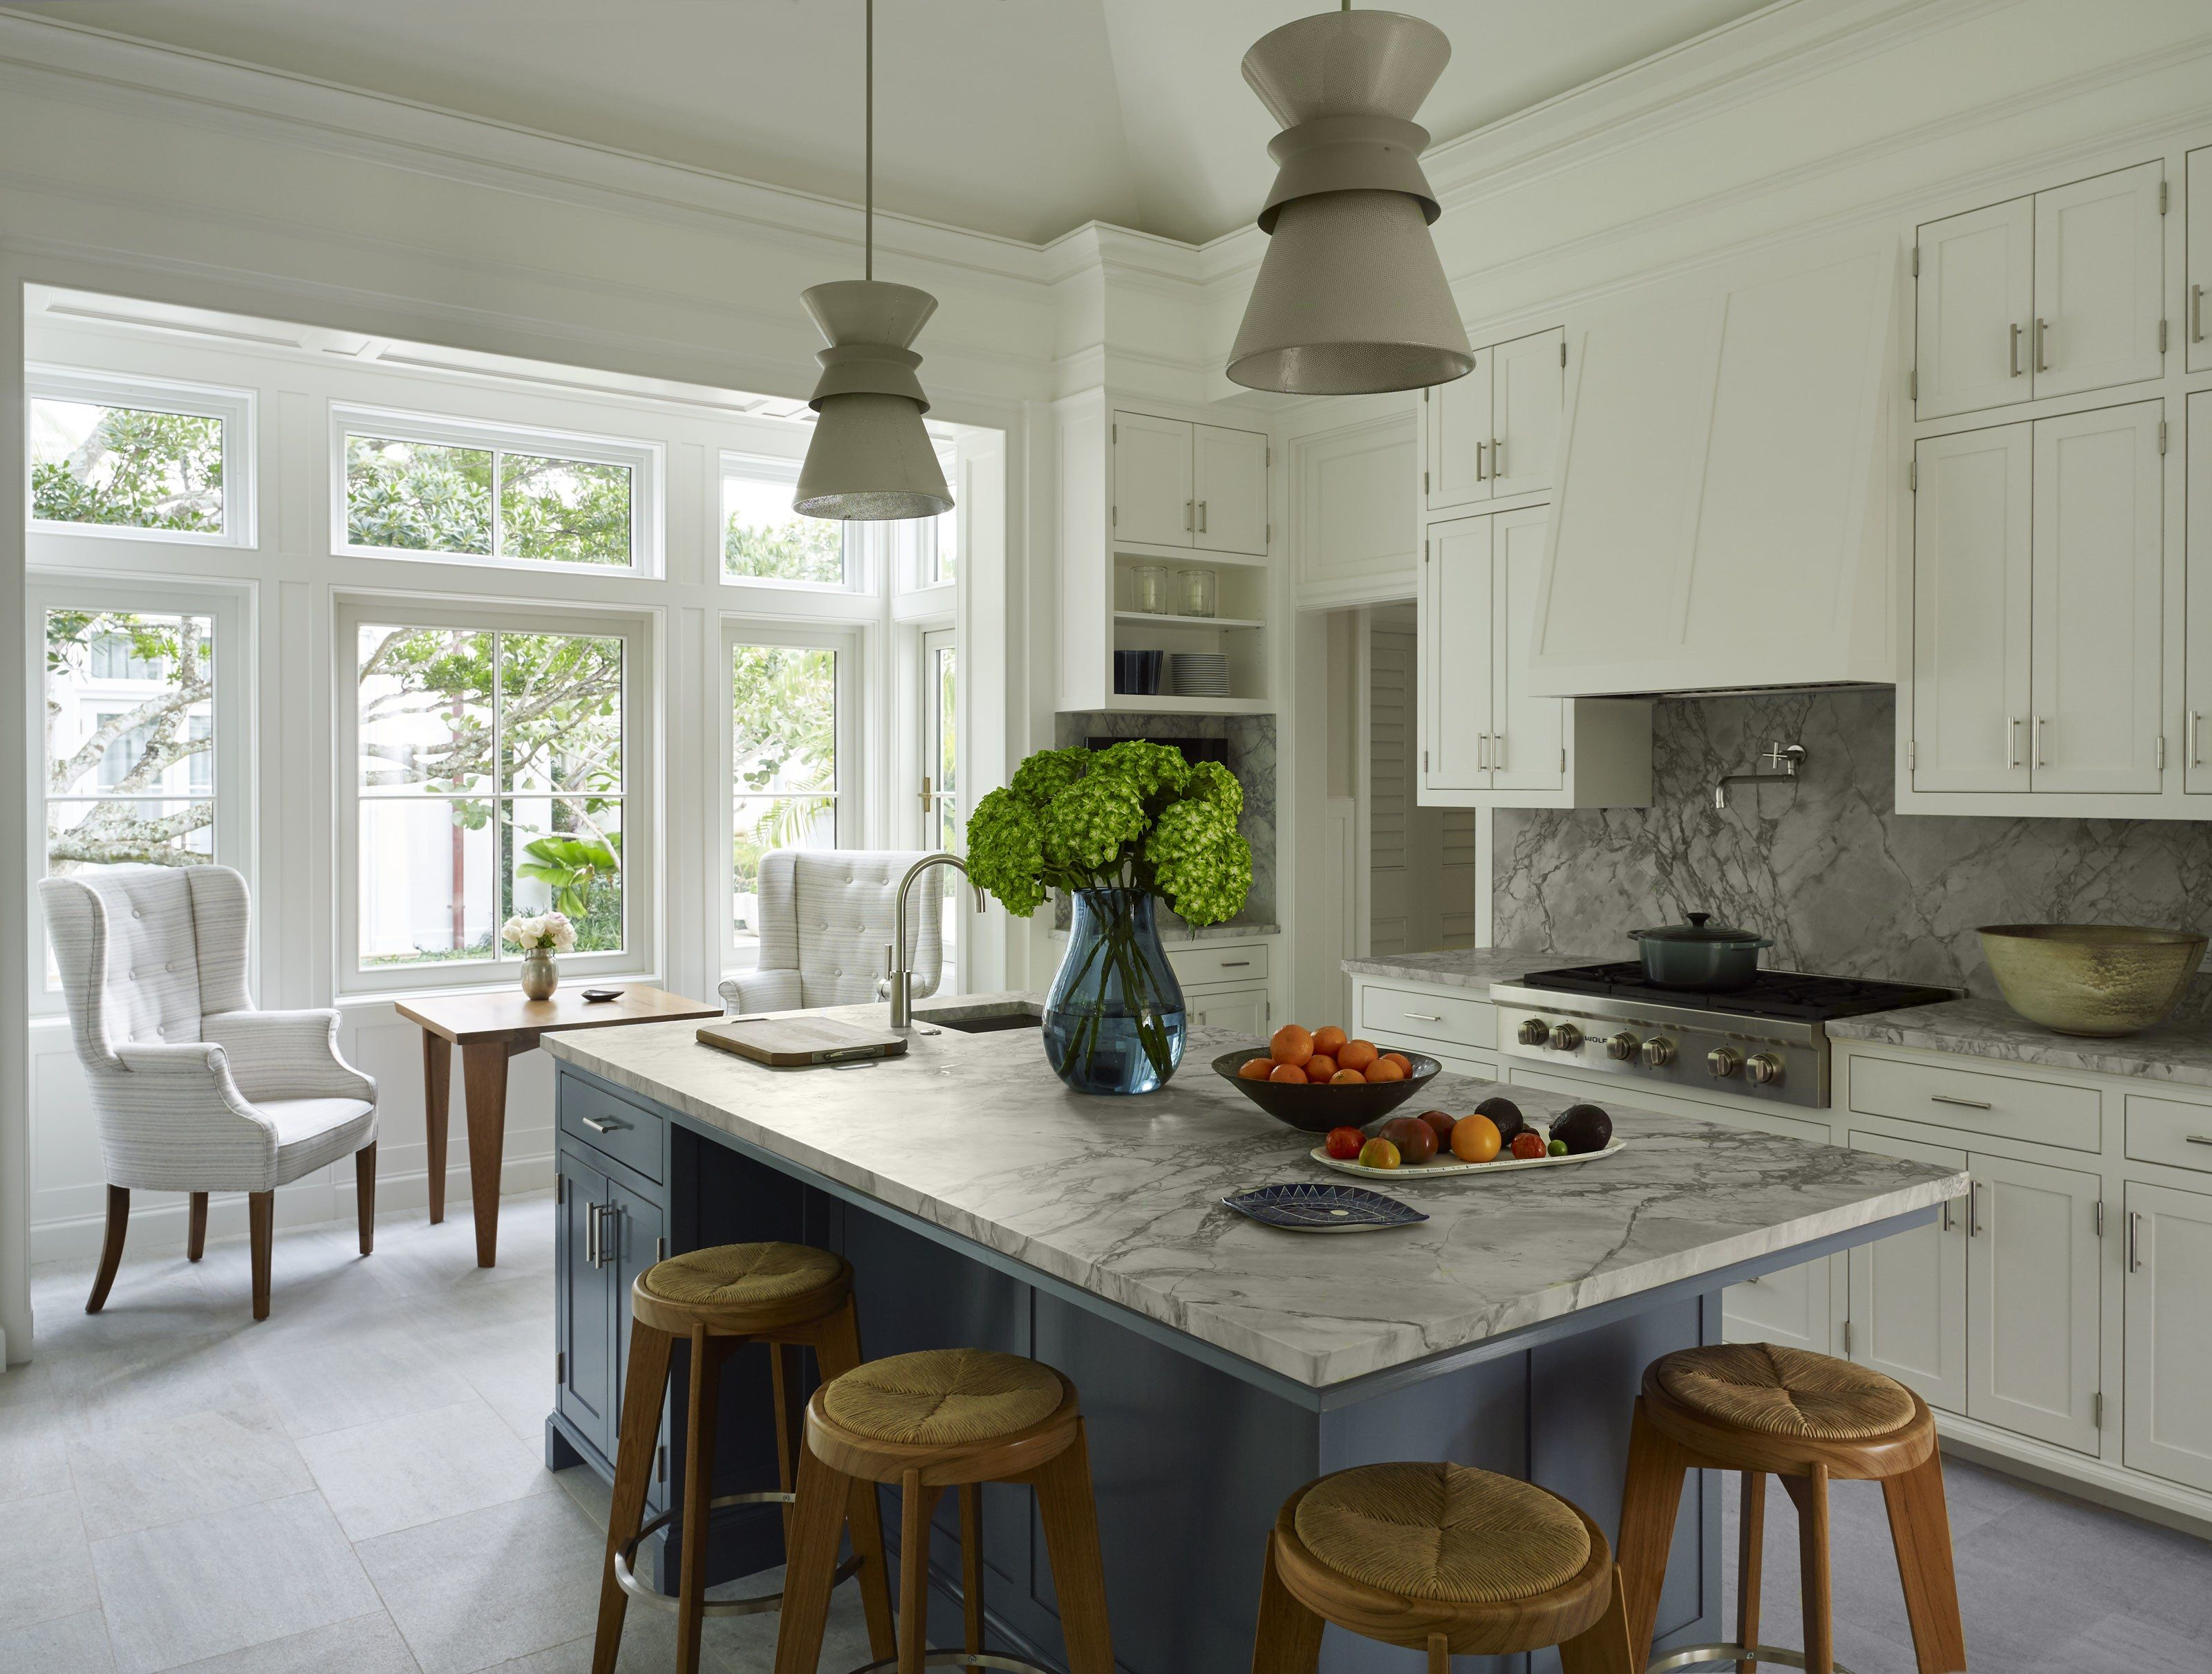 A Classic Georgian Home With A Modernist Twist In Palm Beach Kitchen Interior Kitchen Design Mediterranean Home Decor